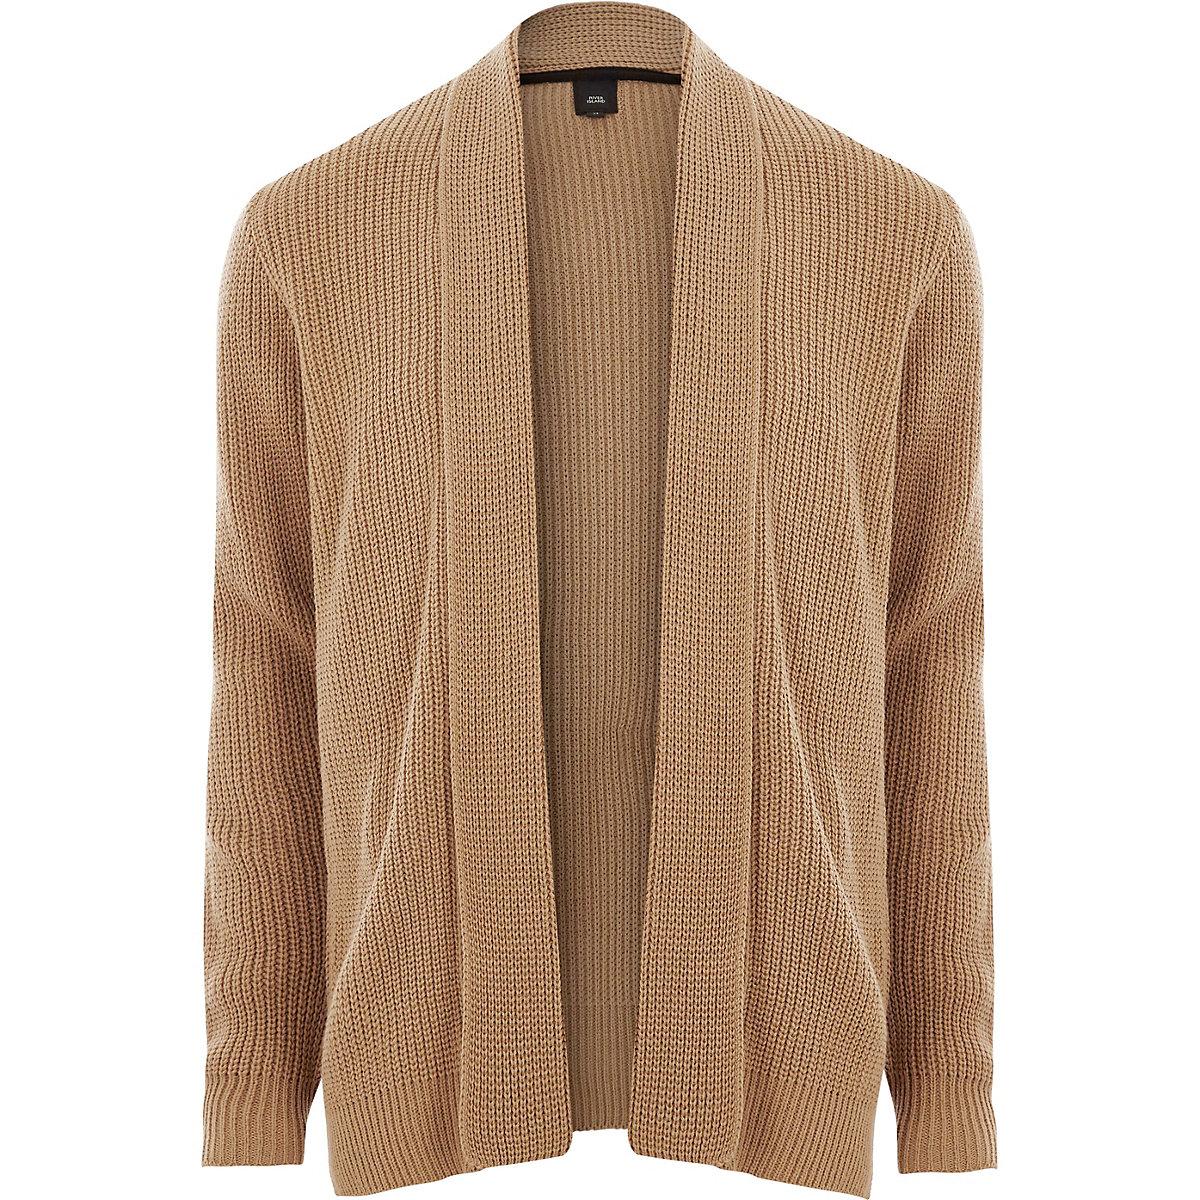 Light brown open front rib knit cardigan